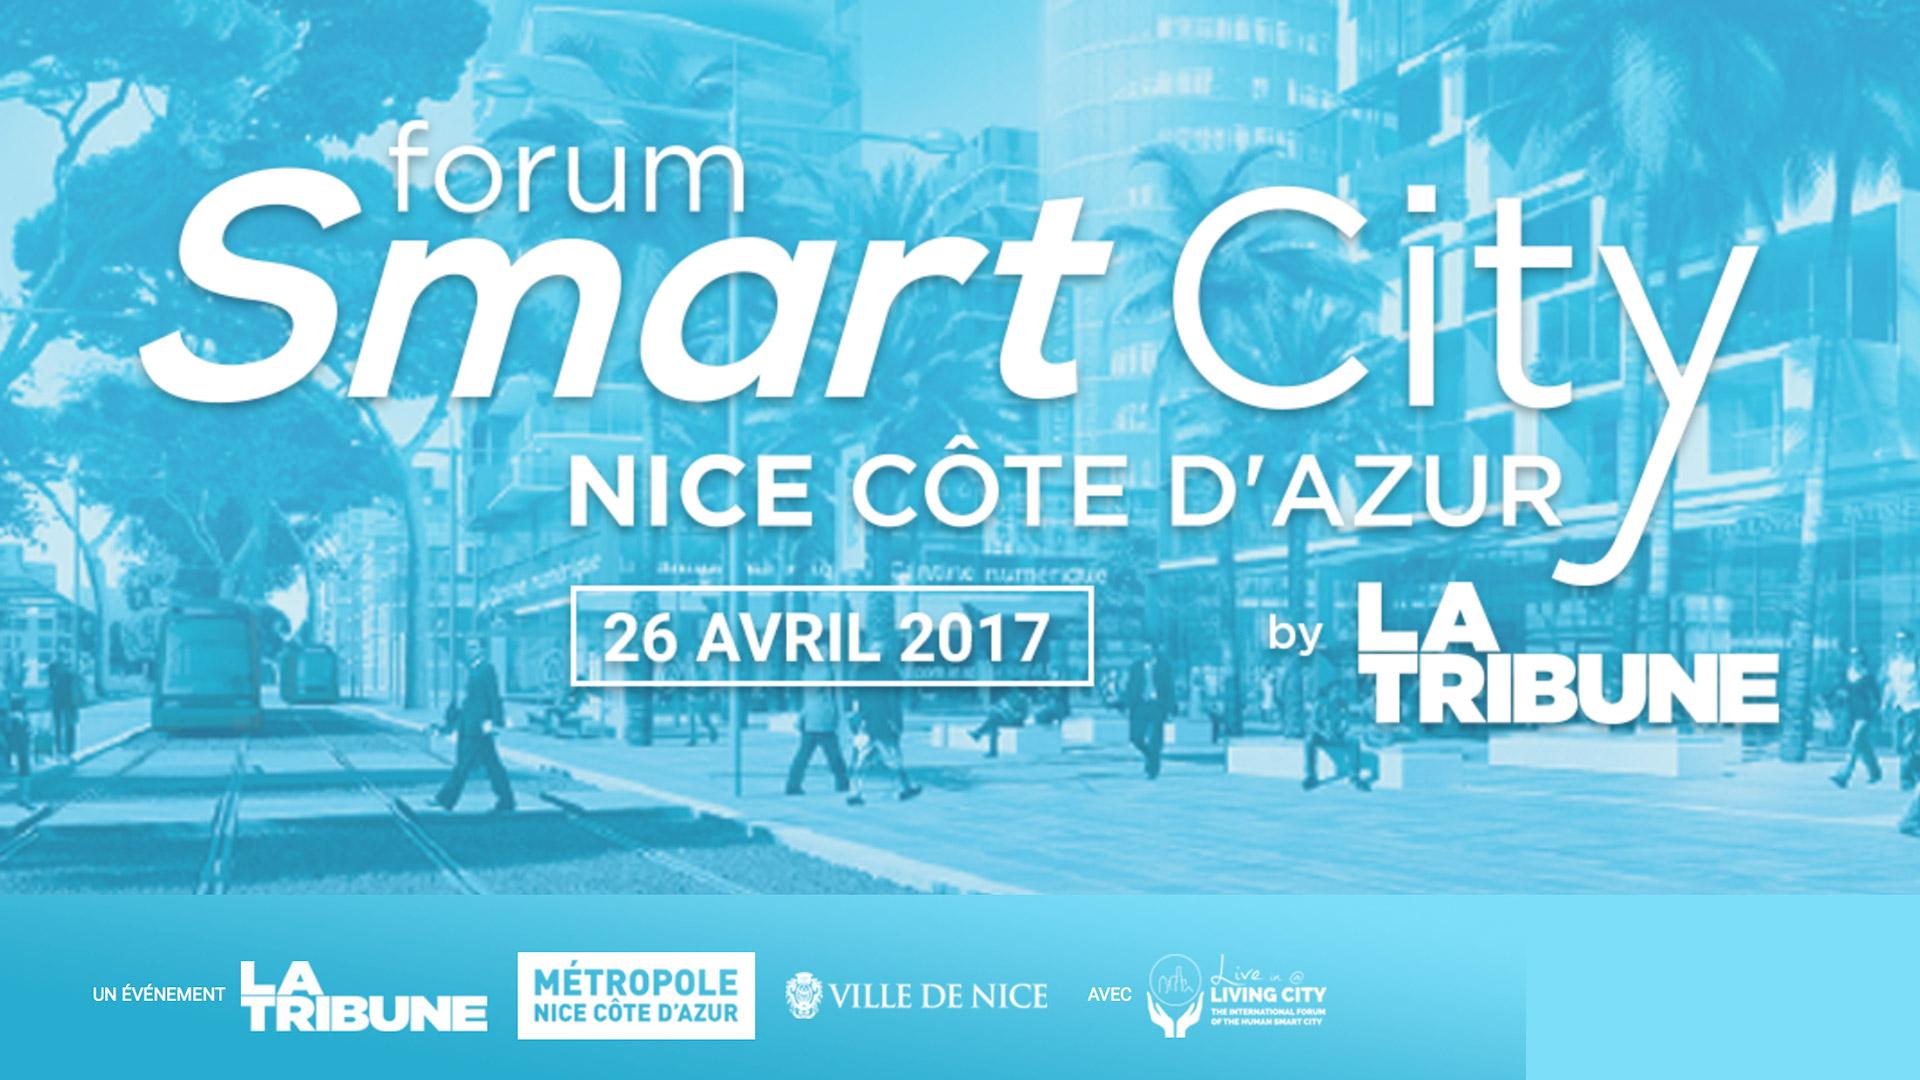 Carlos Moreno présidera le comité scientifique du Forum Smart City Nice